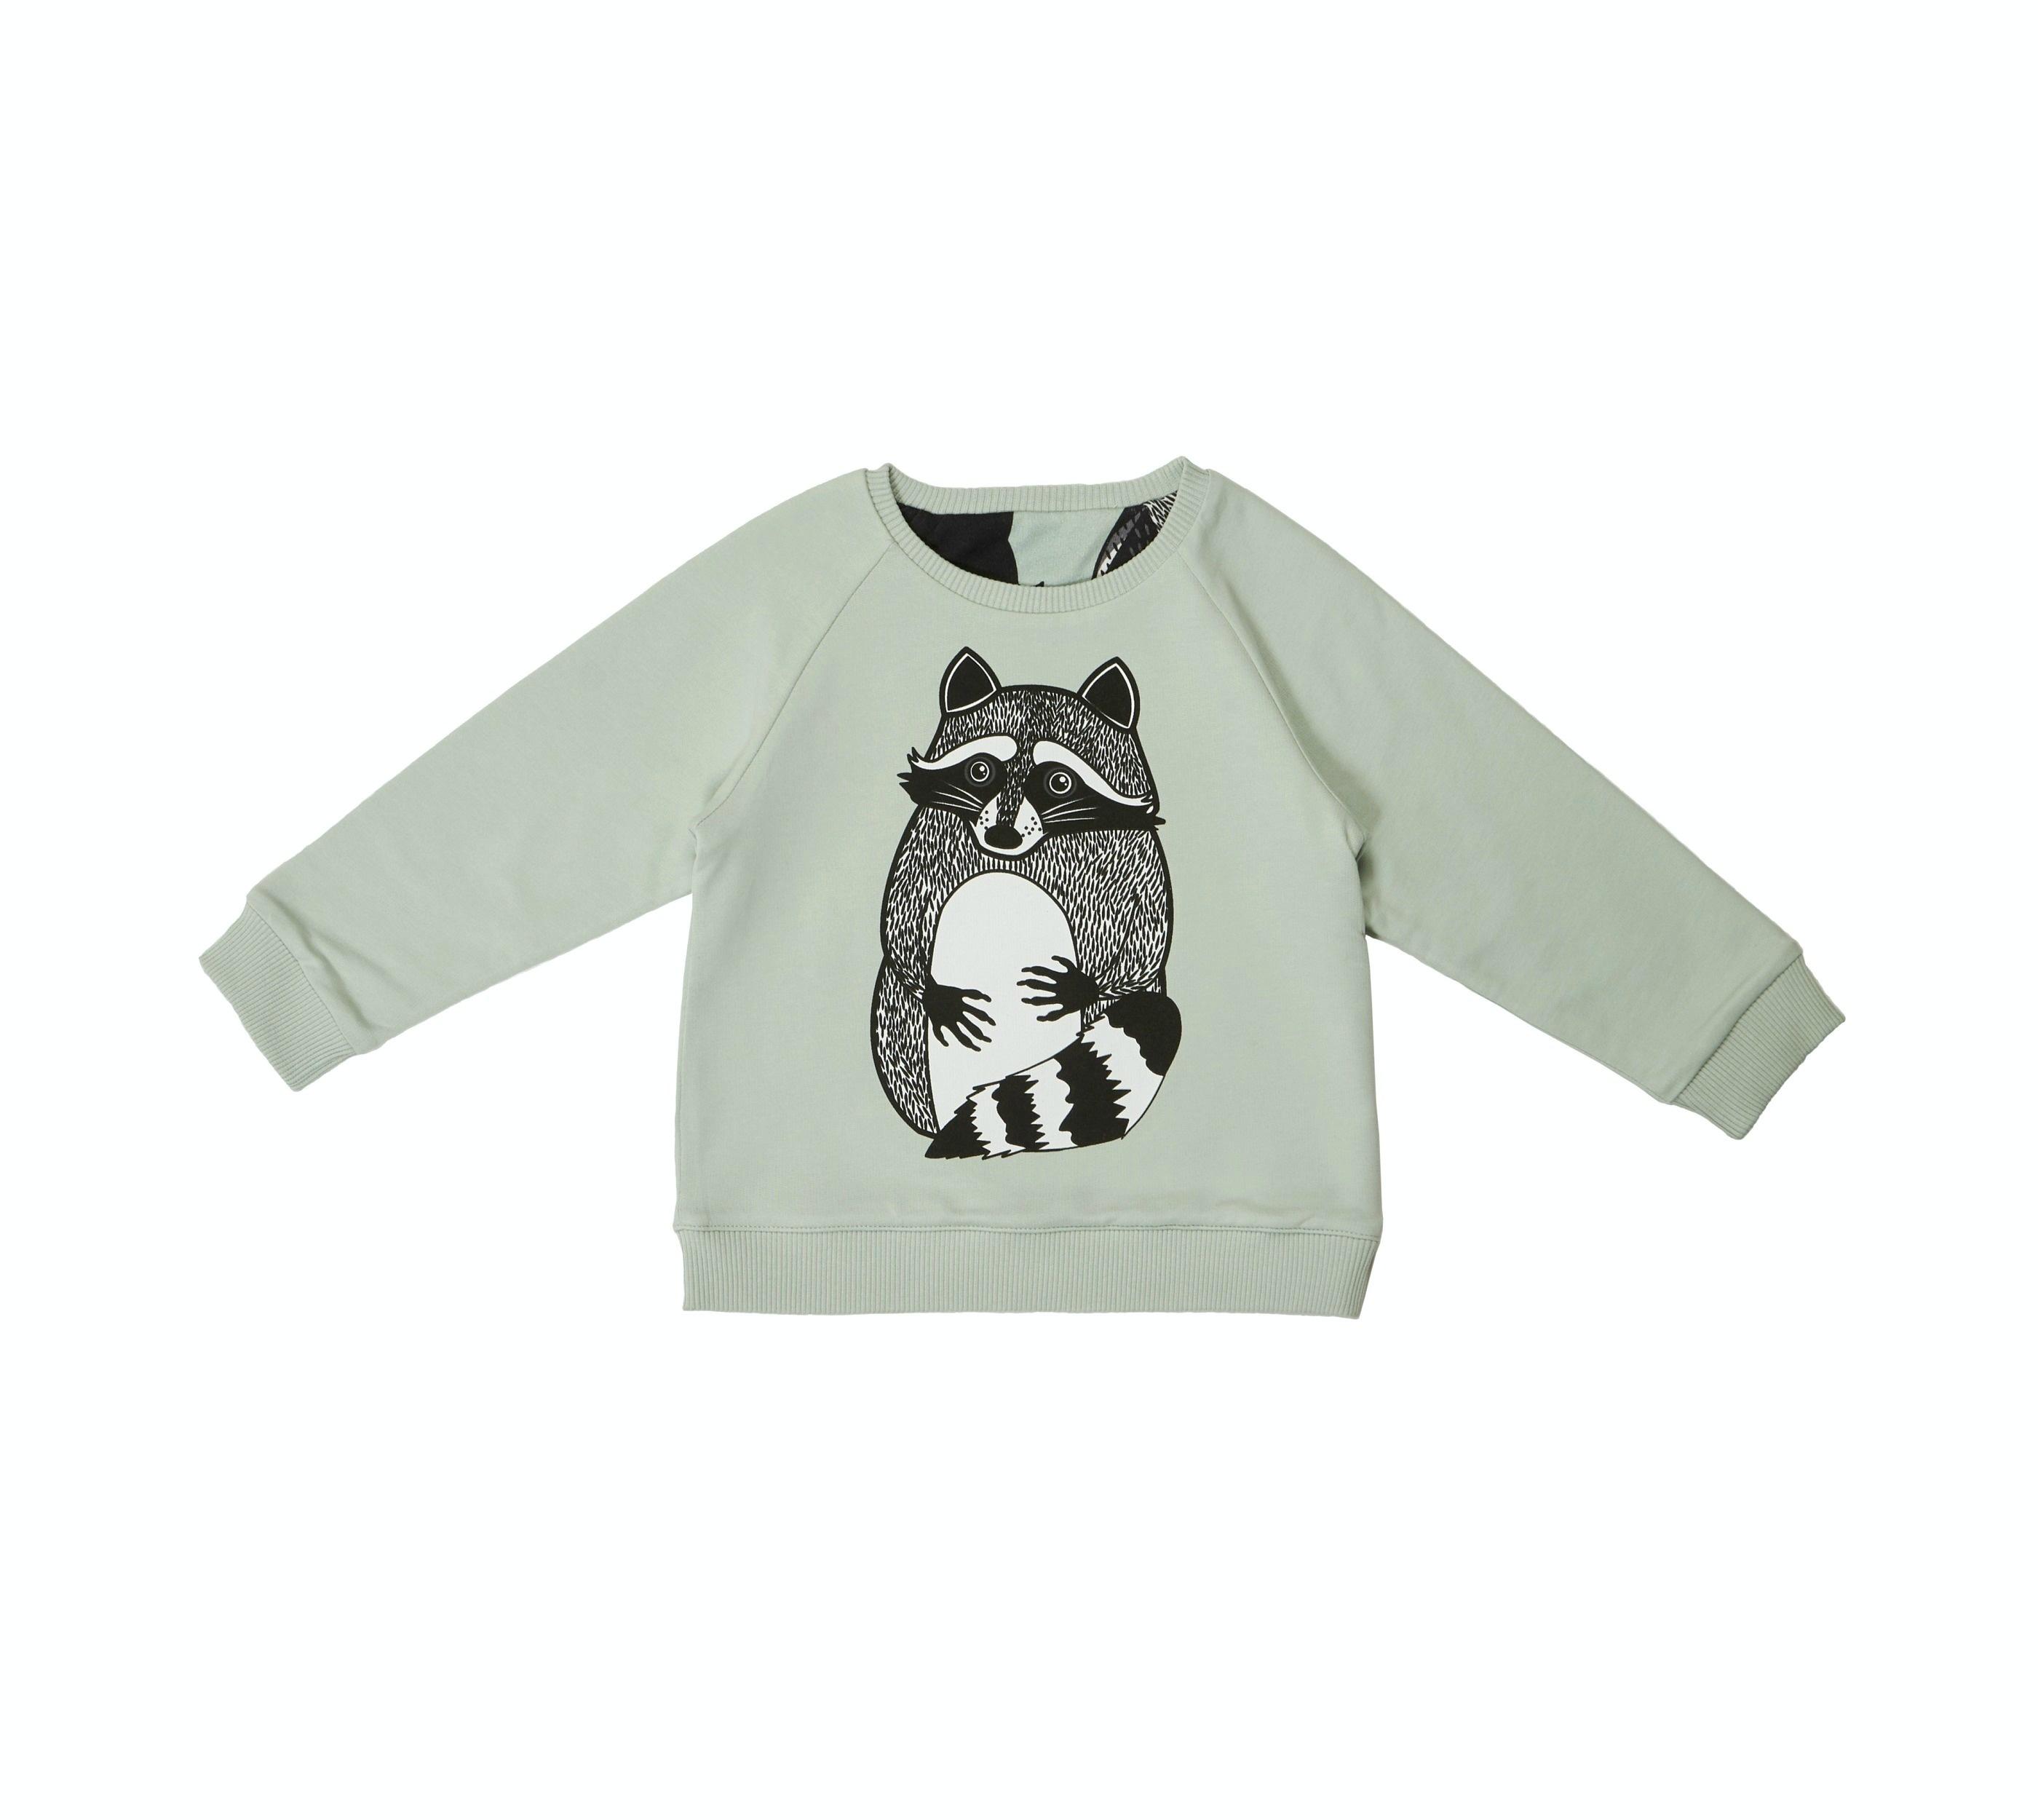 18SSRSR Reversible sweatshirt Raccoon solitary side